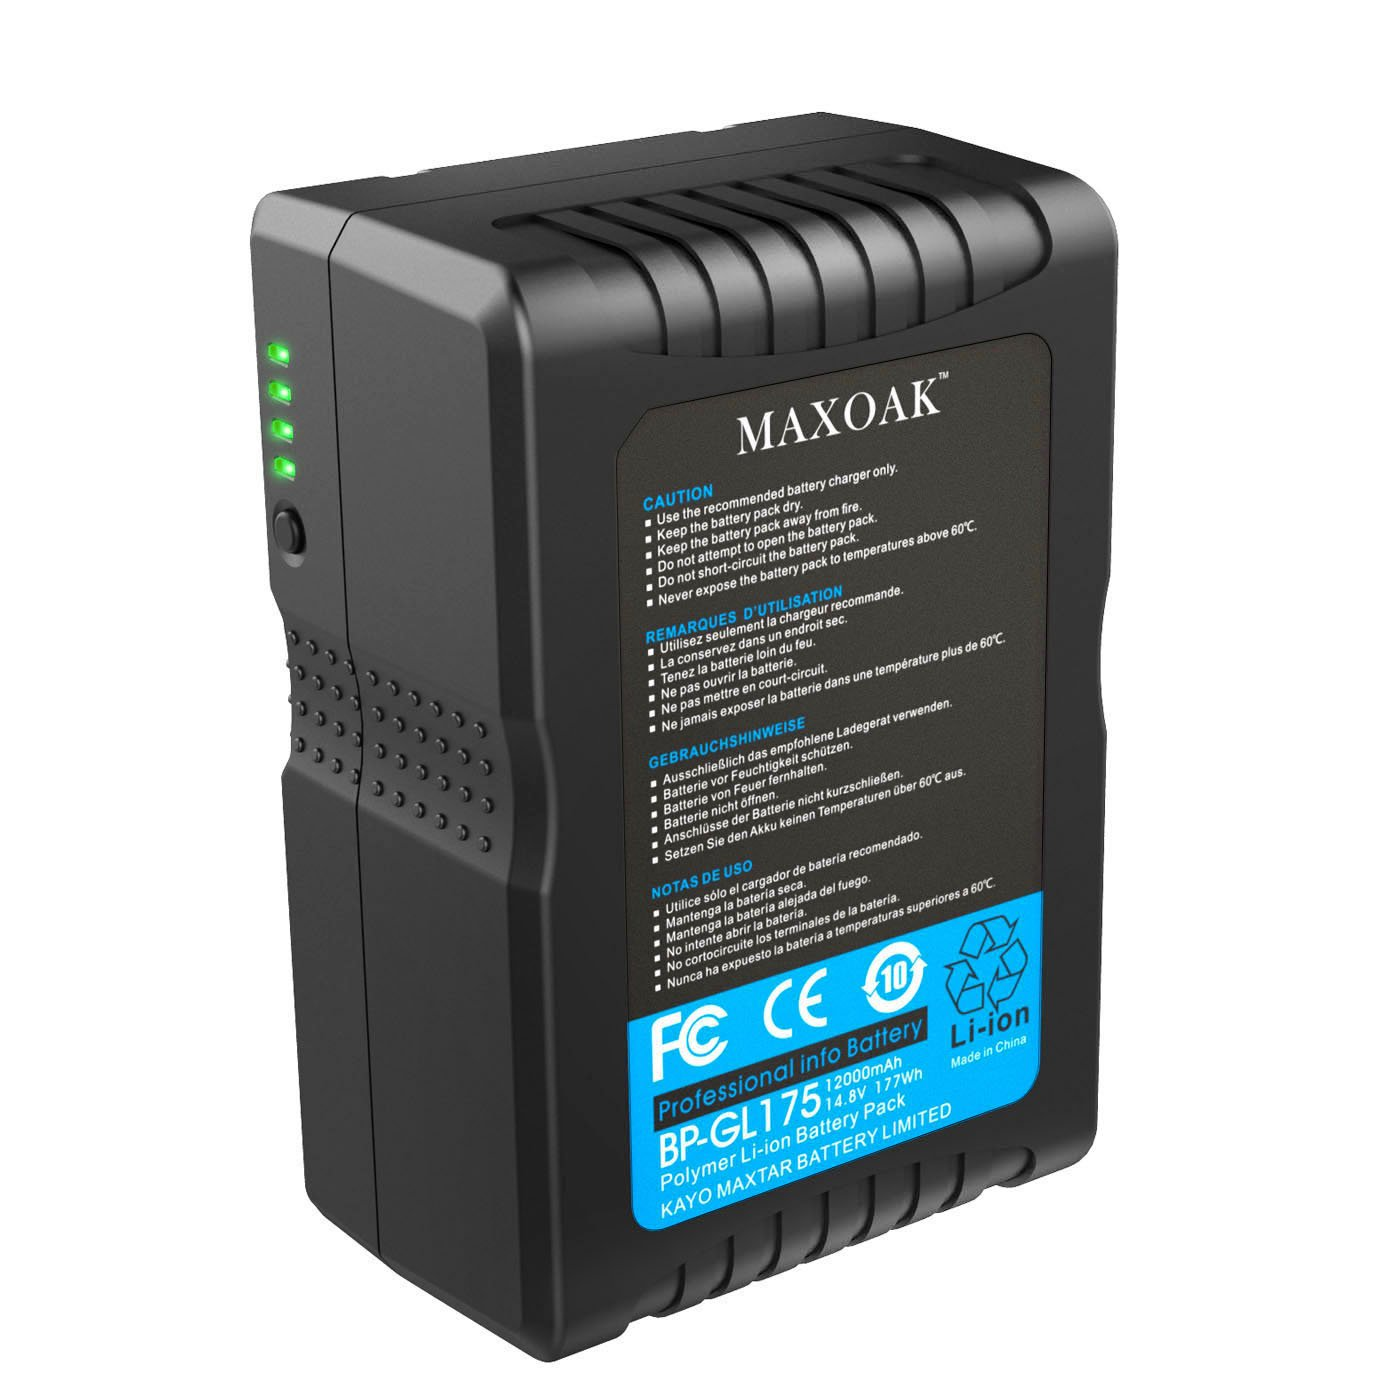 MAXOAK 177 (12000mAh/14.8V) V Mount Battery for Video Camera Camcorder (not for RED series) by MAXOAK